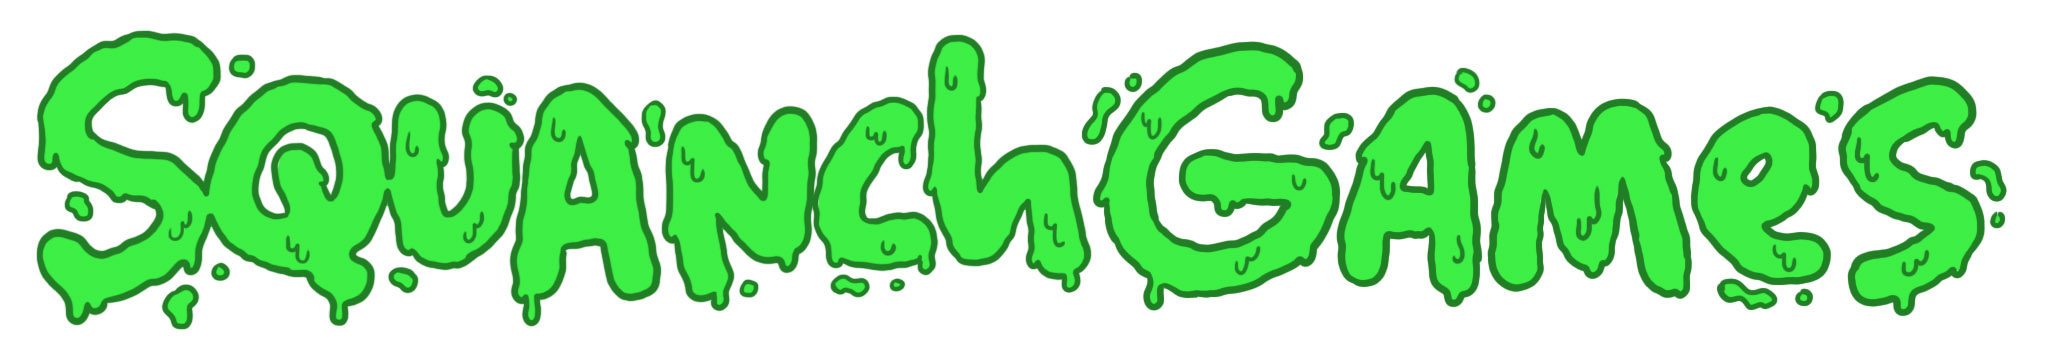 SquanchGames Slime.jpg